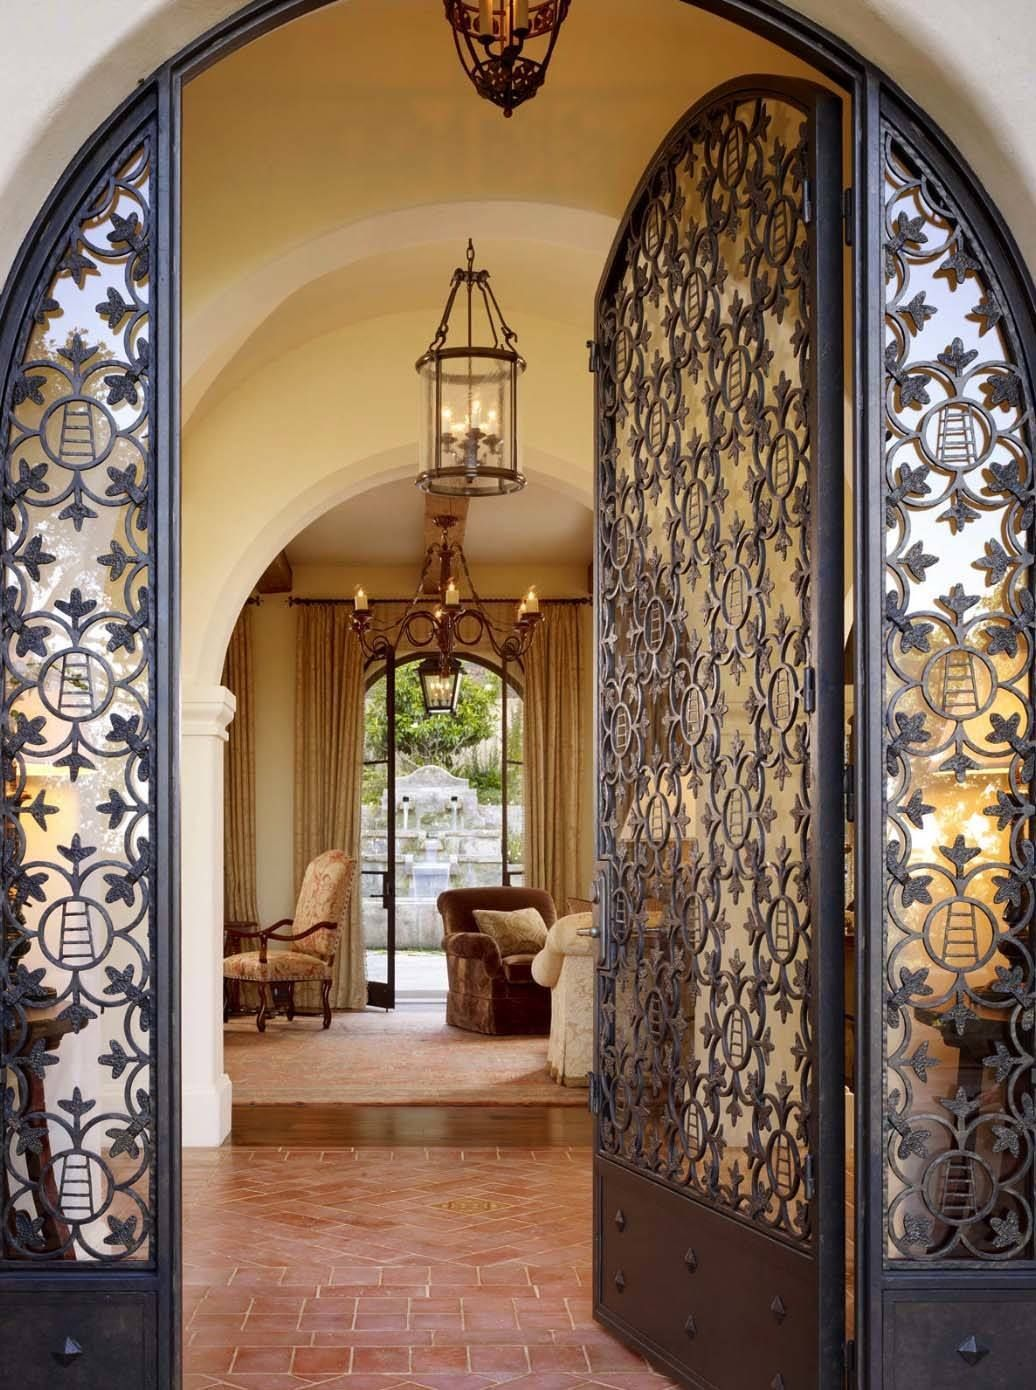 Spanish Style Hacienda In Carmel Valley Showcases Inviting